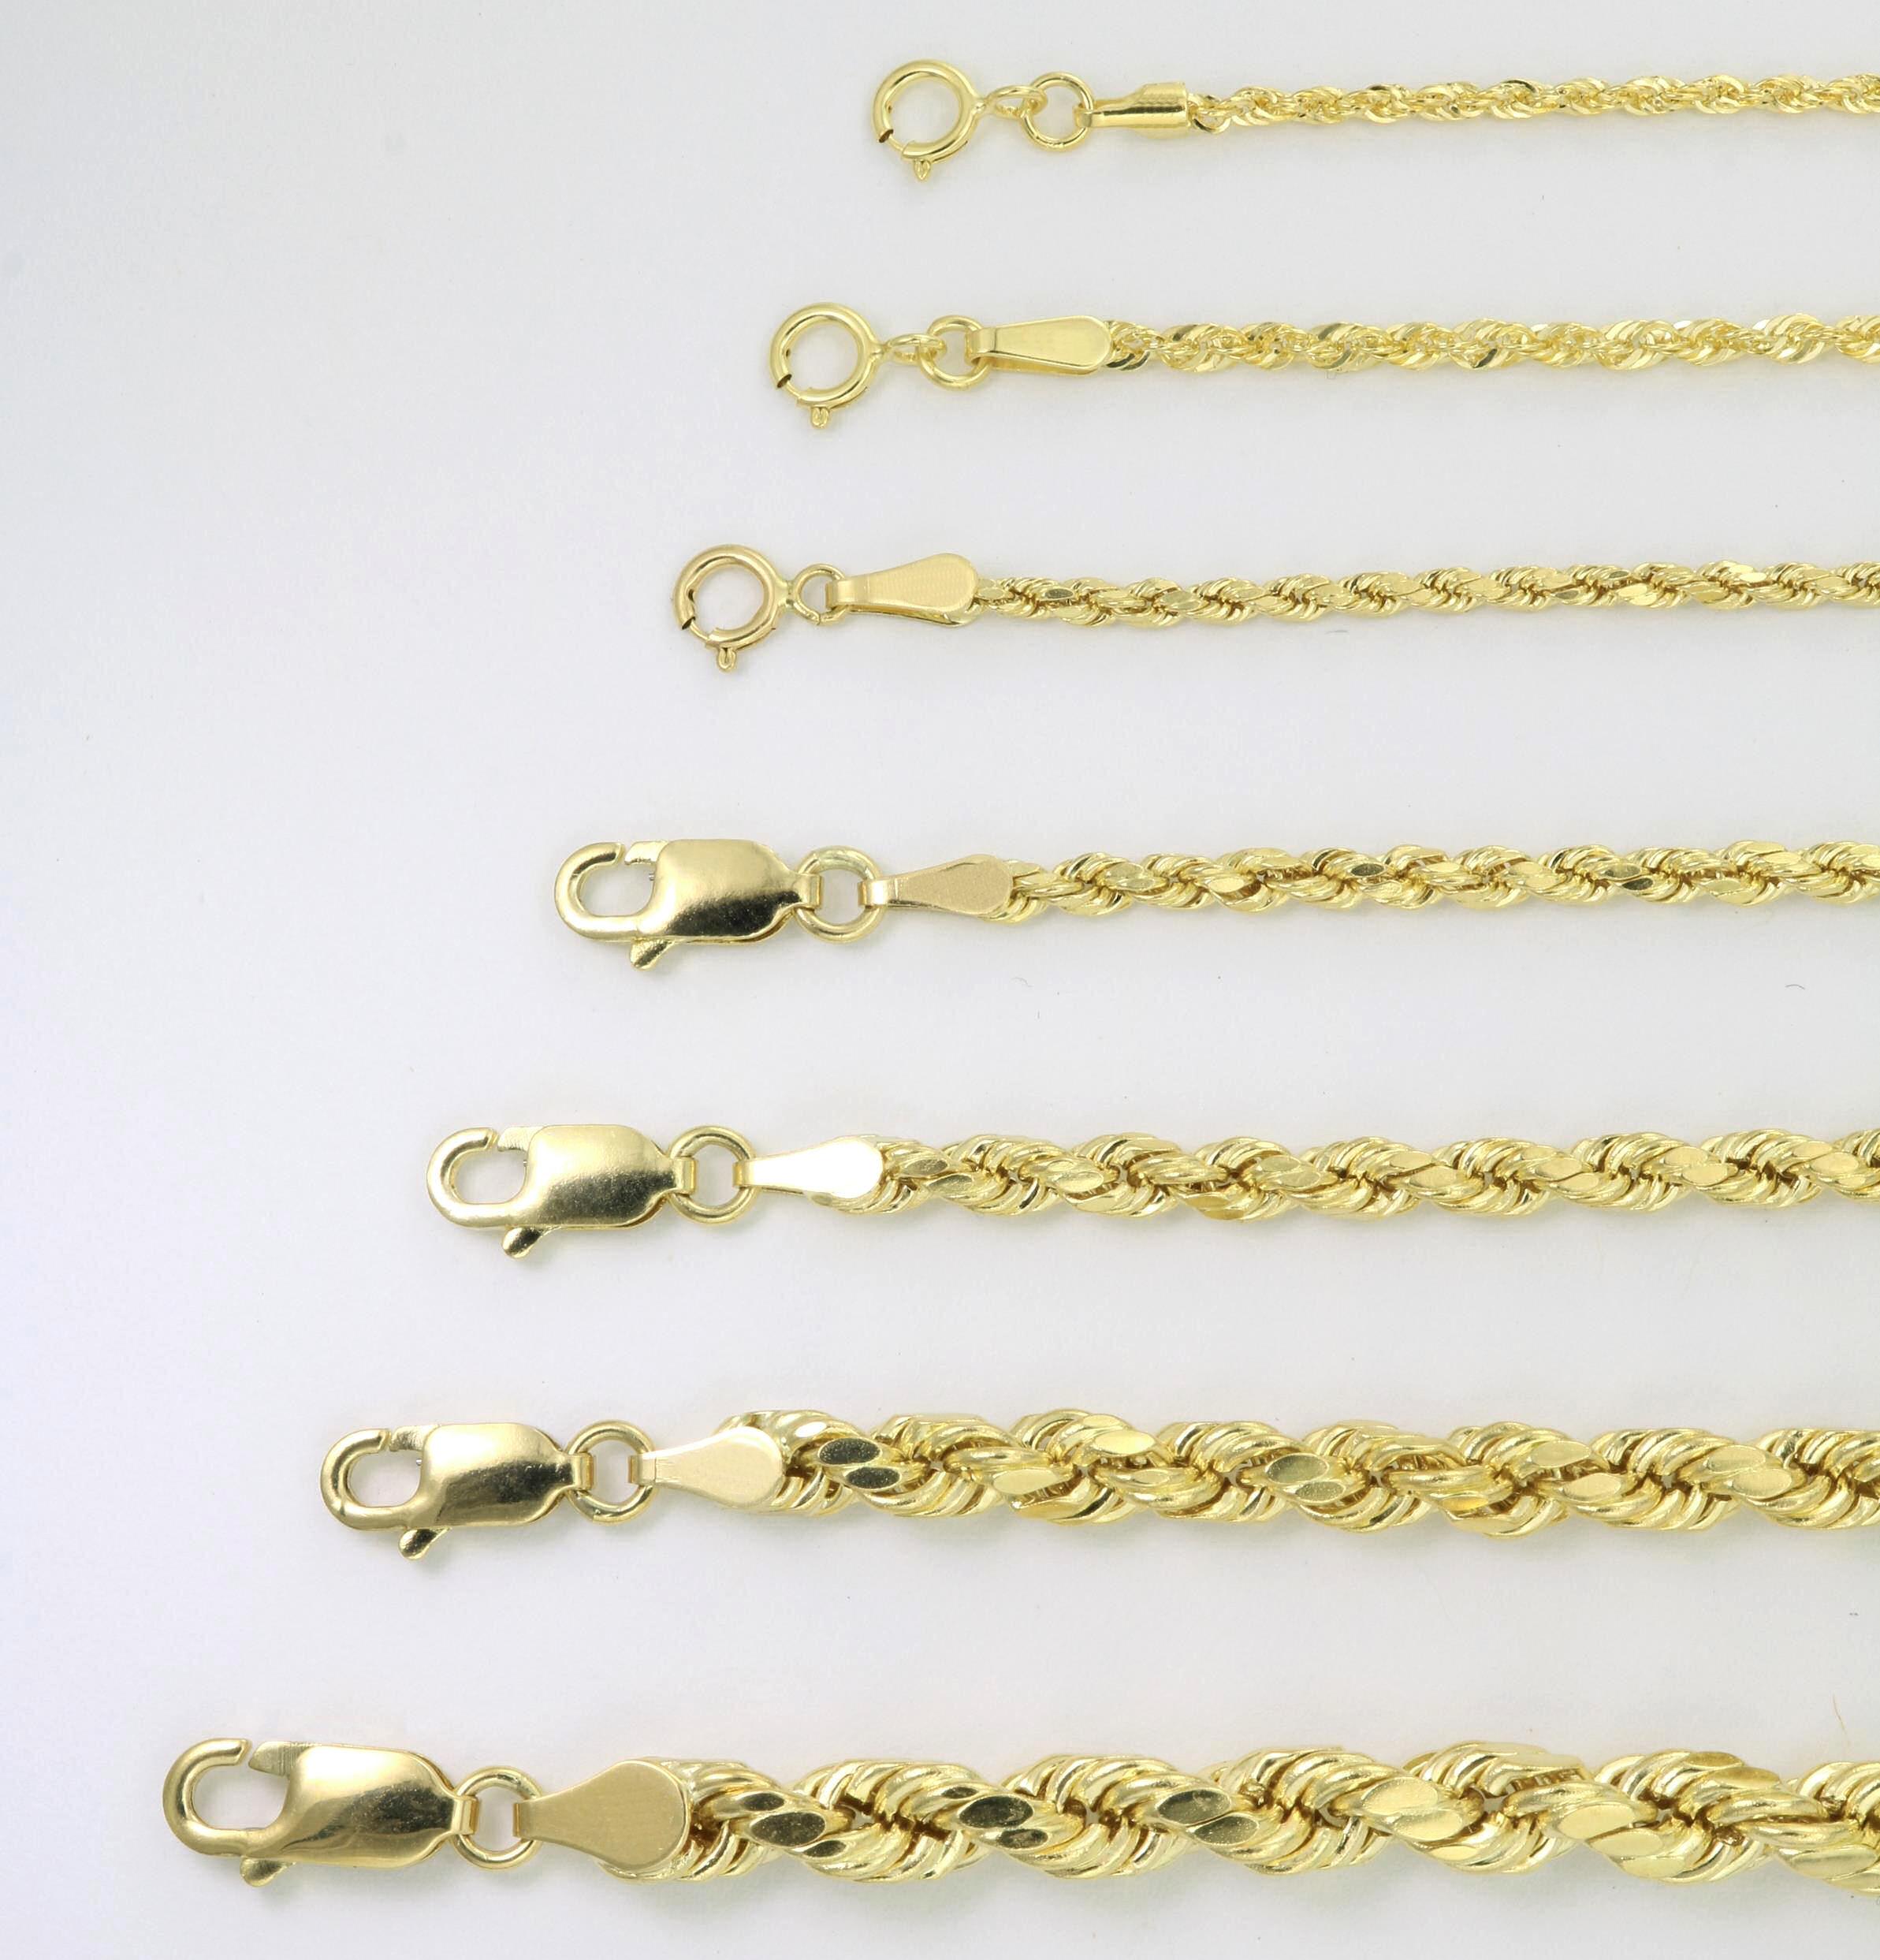 "10K Yellow Gold Light 1.5mm-4mm Diamond Cut Rope Chain Pendant Necklace 14""- 30"" 4"